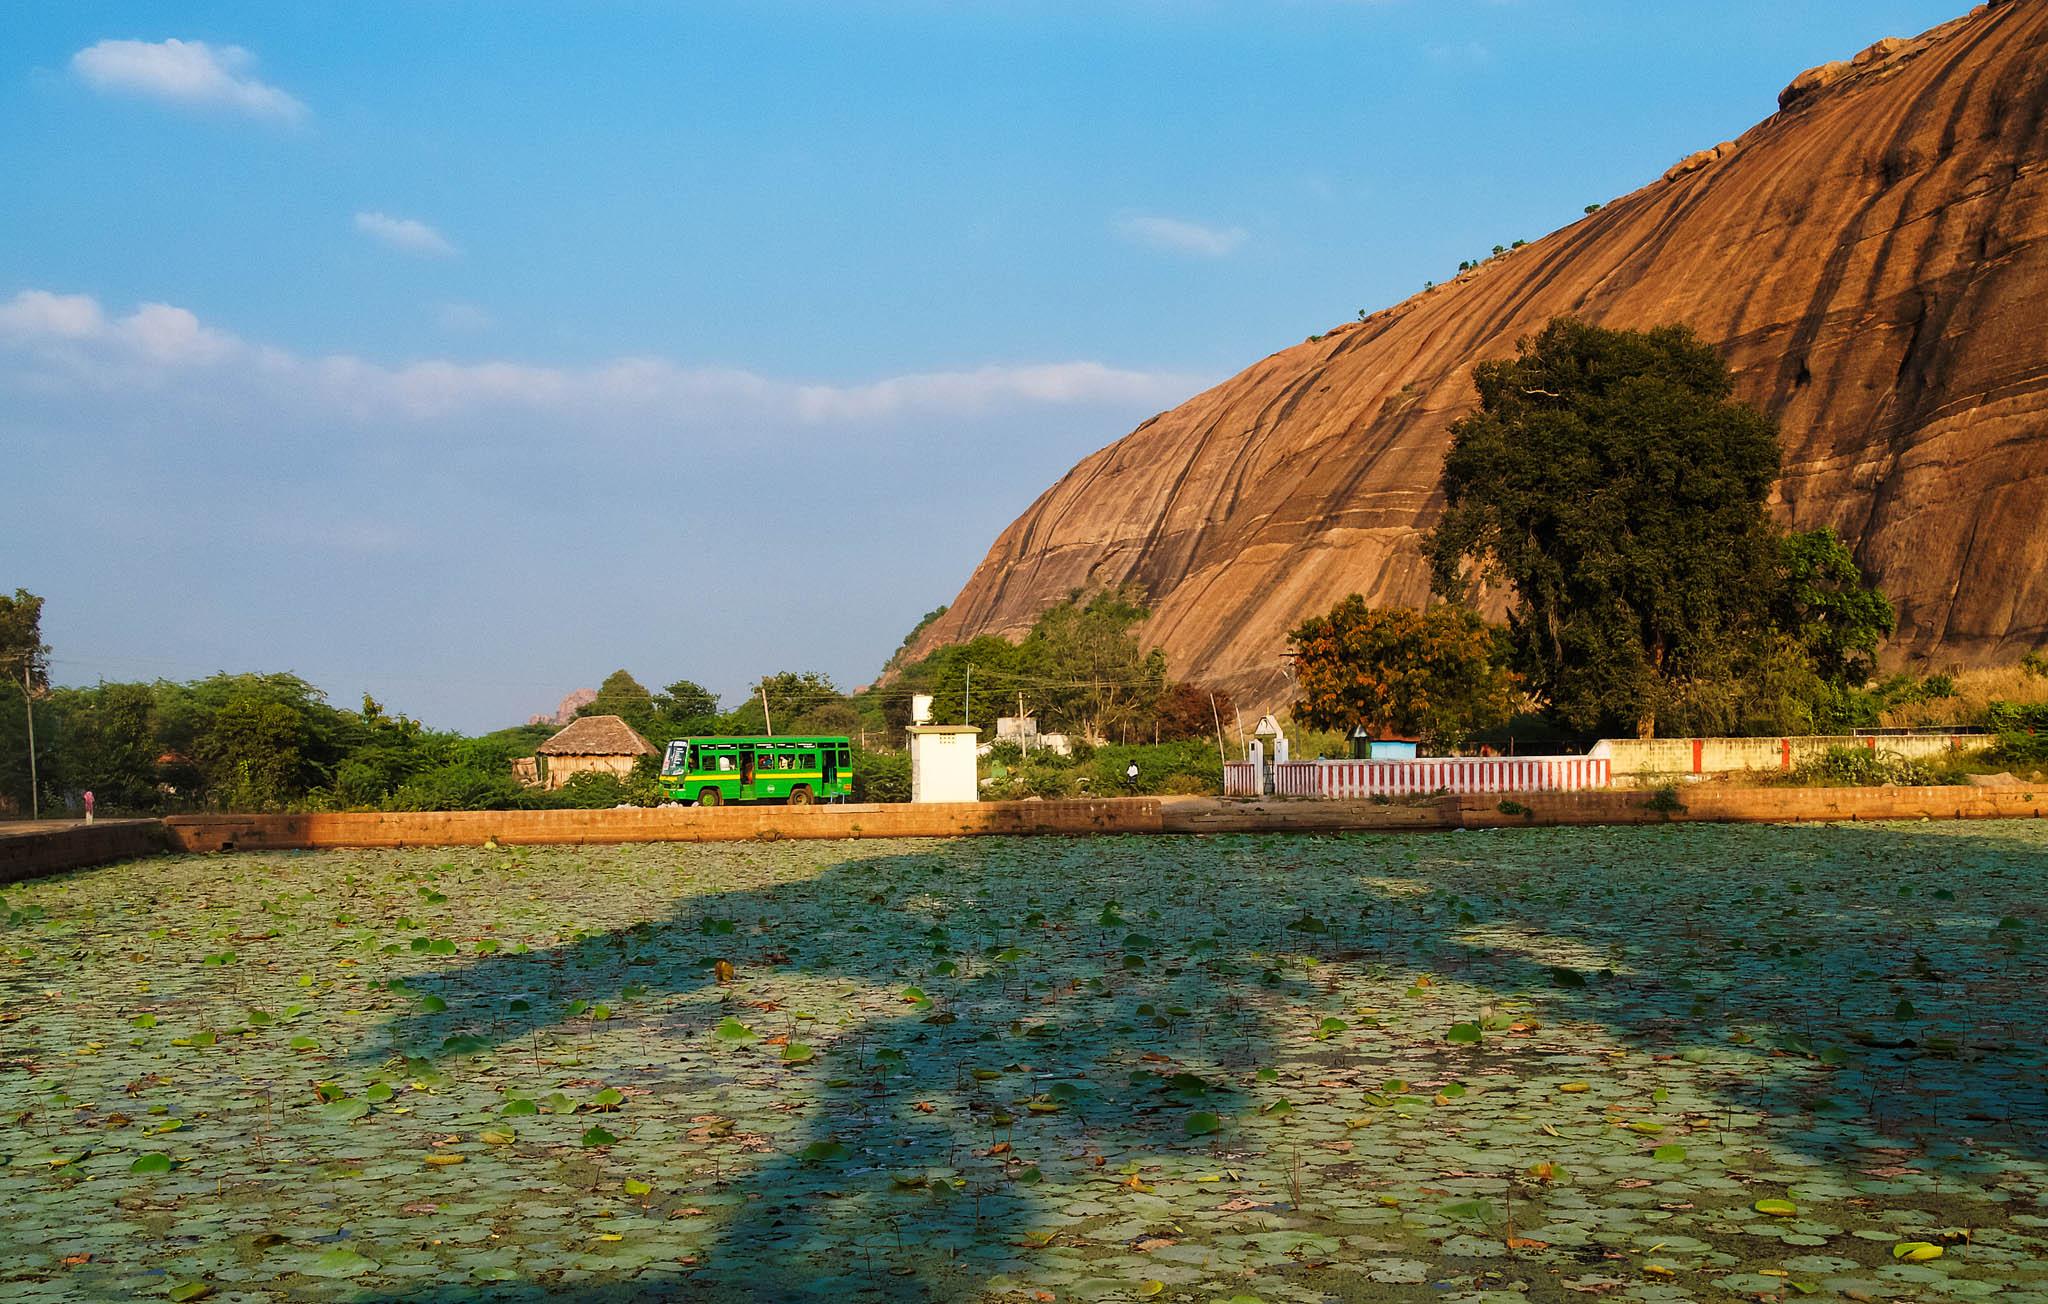 A lotus pond at the base of the Yanamalai mountain and temples, Yanamalai, Madurai, Tamil Nadu, India